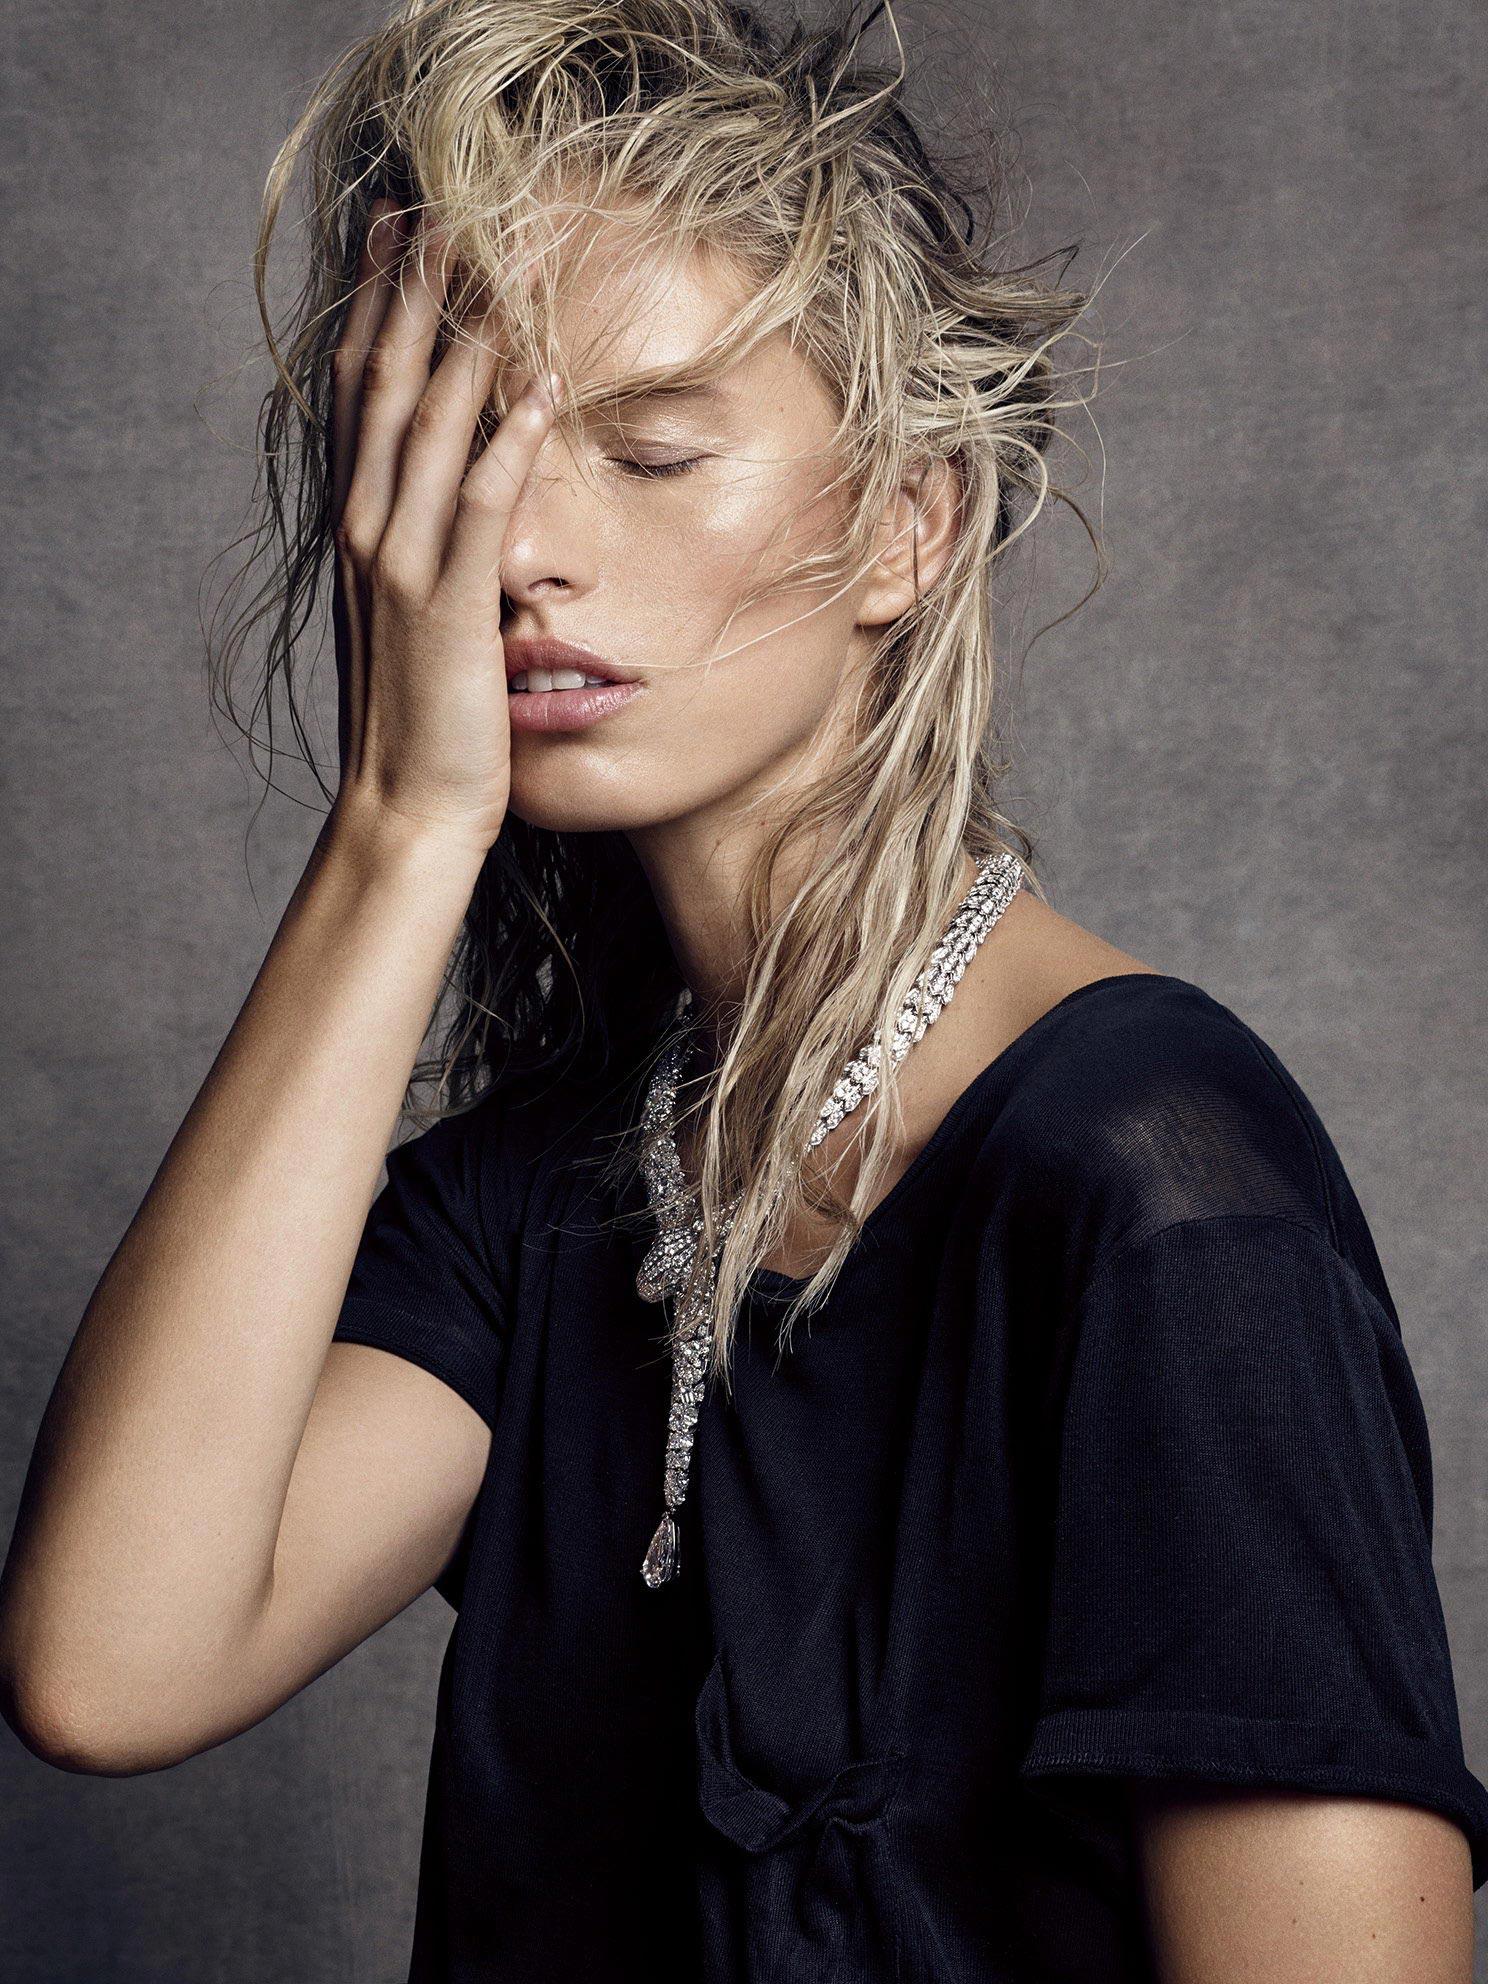 Karolina Kurkova Photoshoot For Vogue Magazine Spain